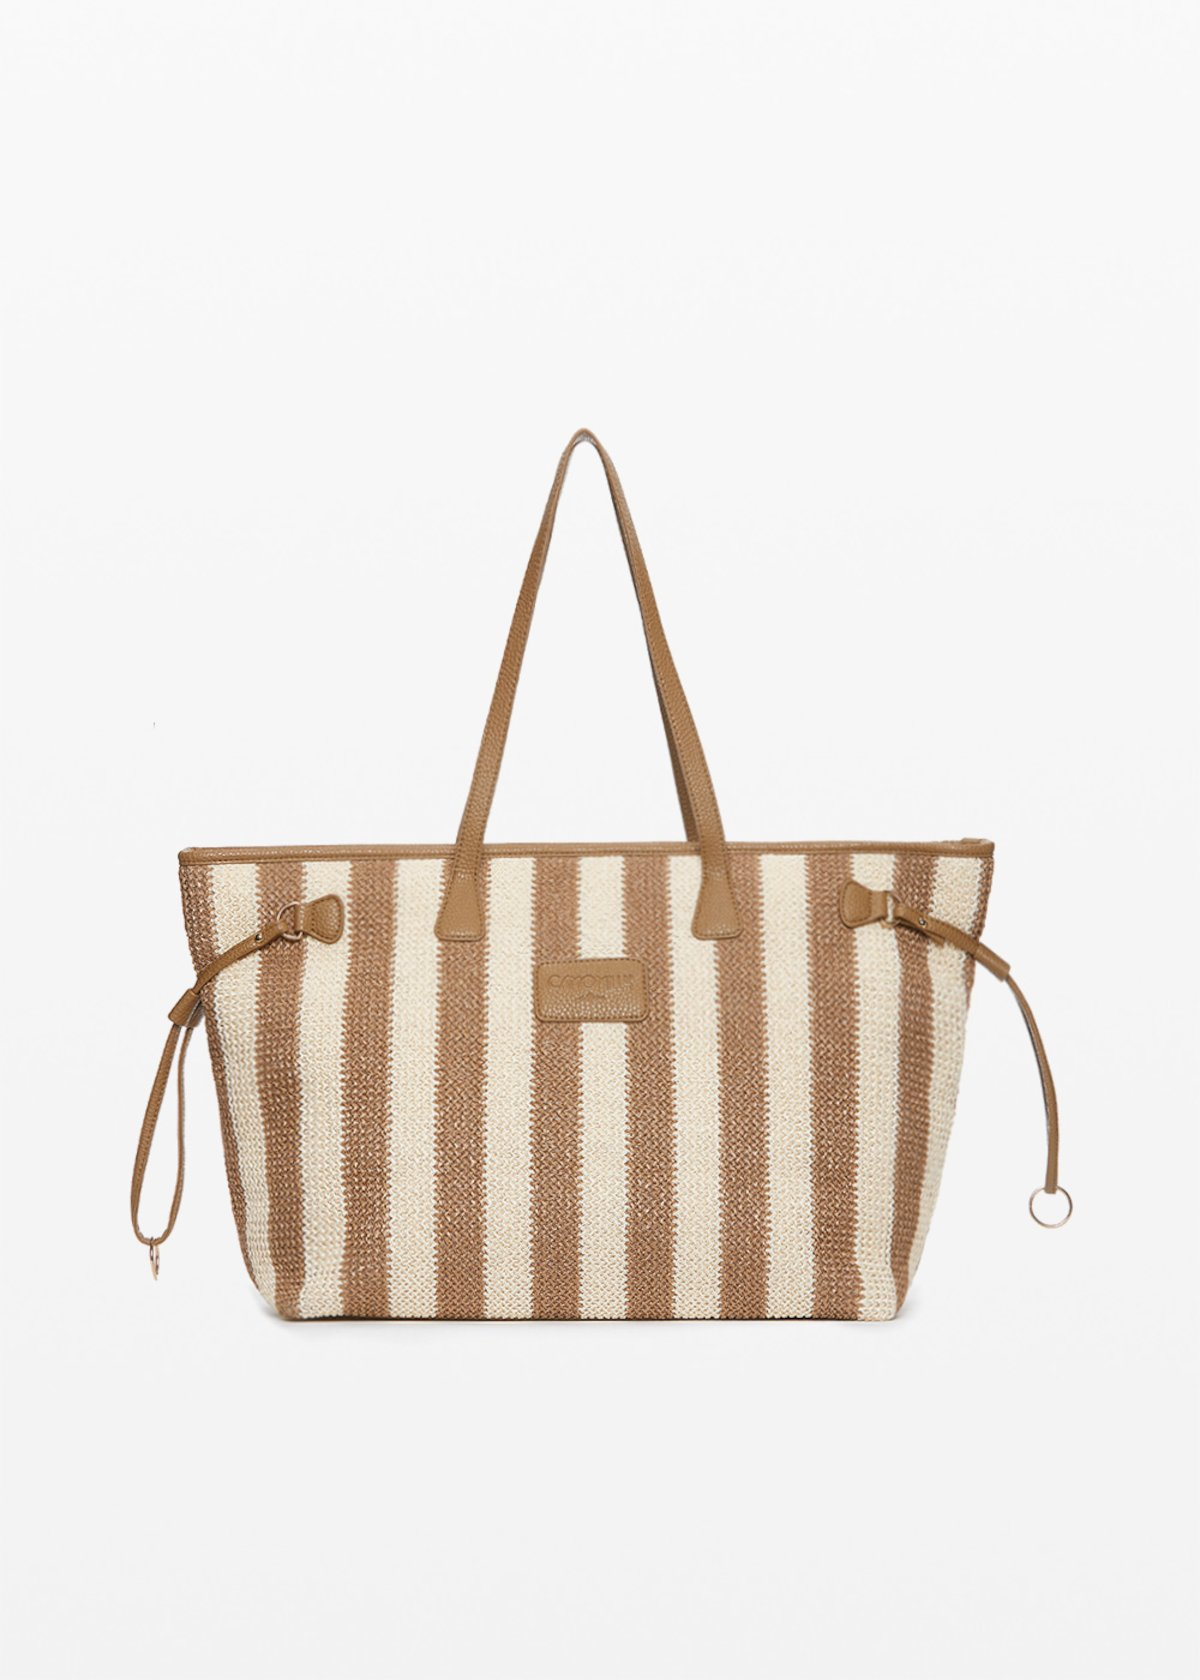 Shopping bag Nelly in raffia stripes fantasy - Desert / White Stripes - Donna - Immagine categoria